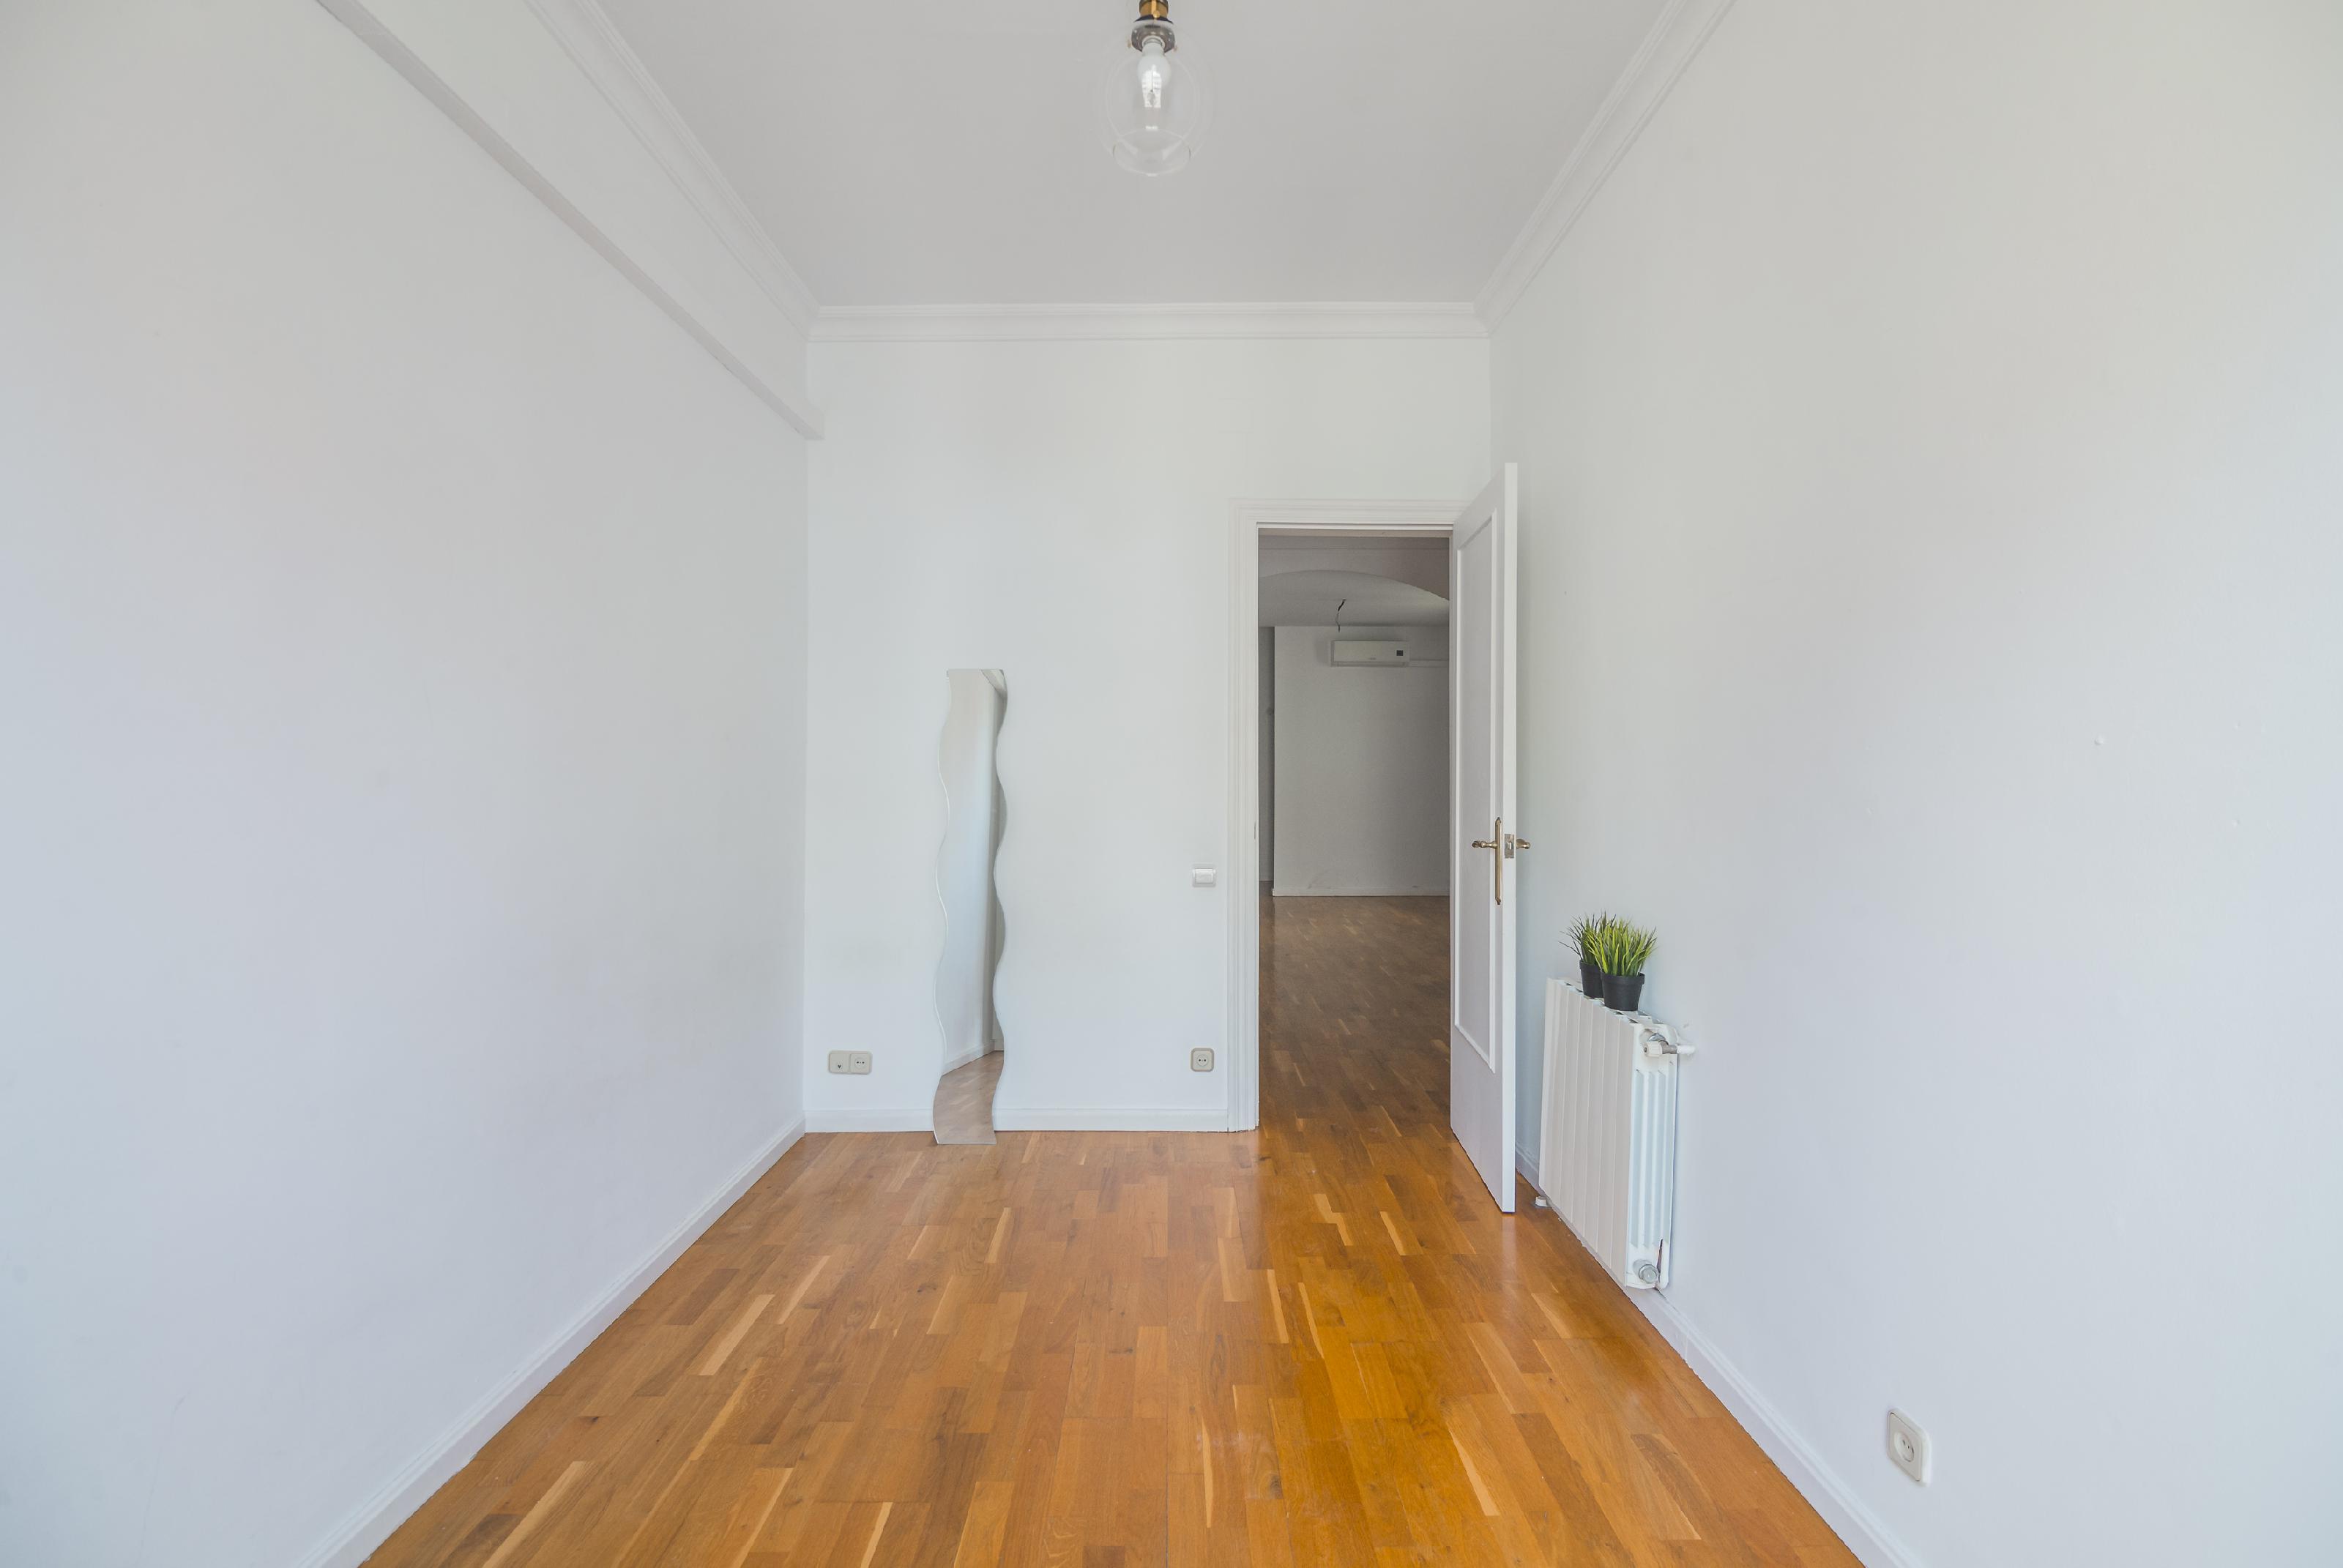 246907 Flat for sale in Eixample, Nova Esquerra Eixample 19